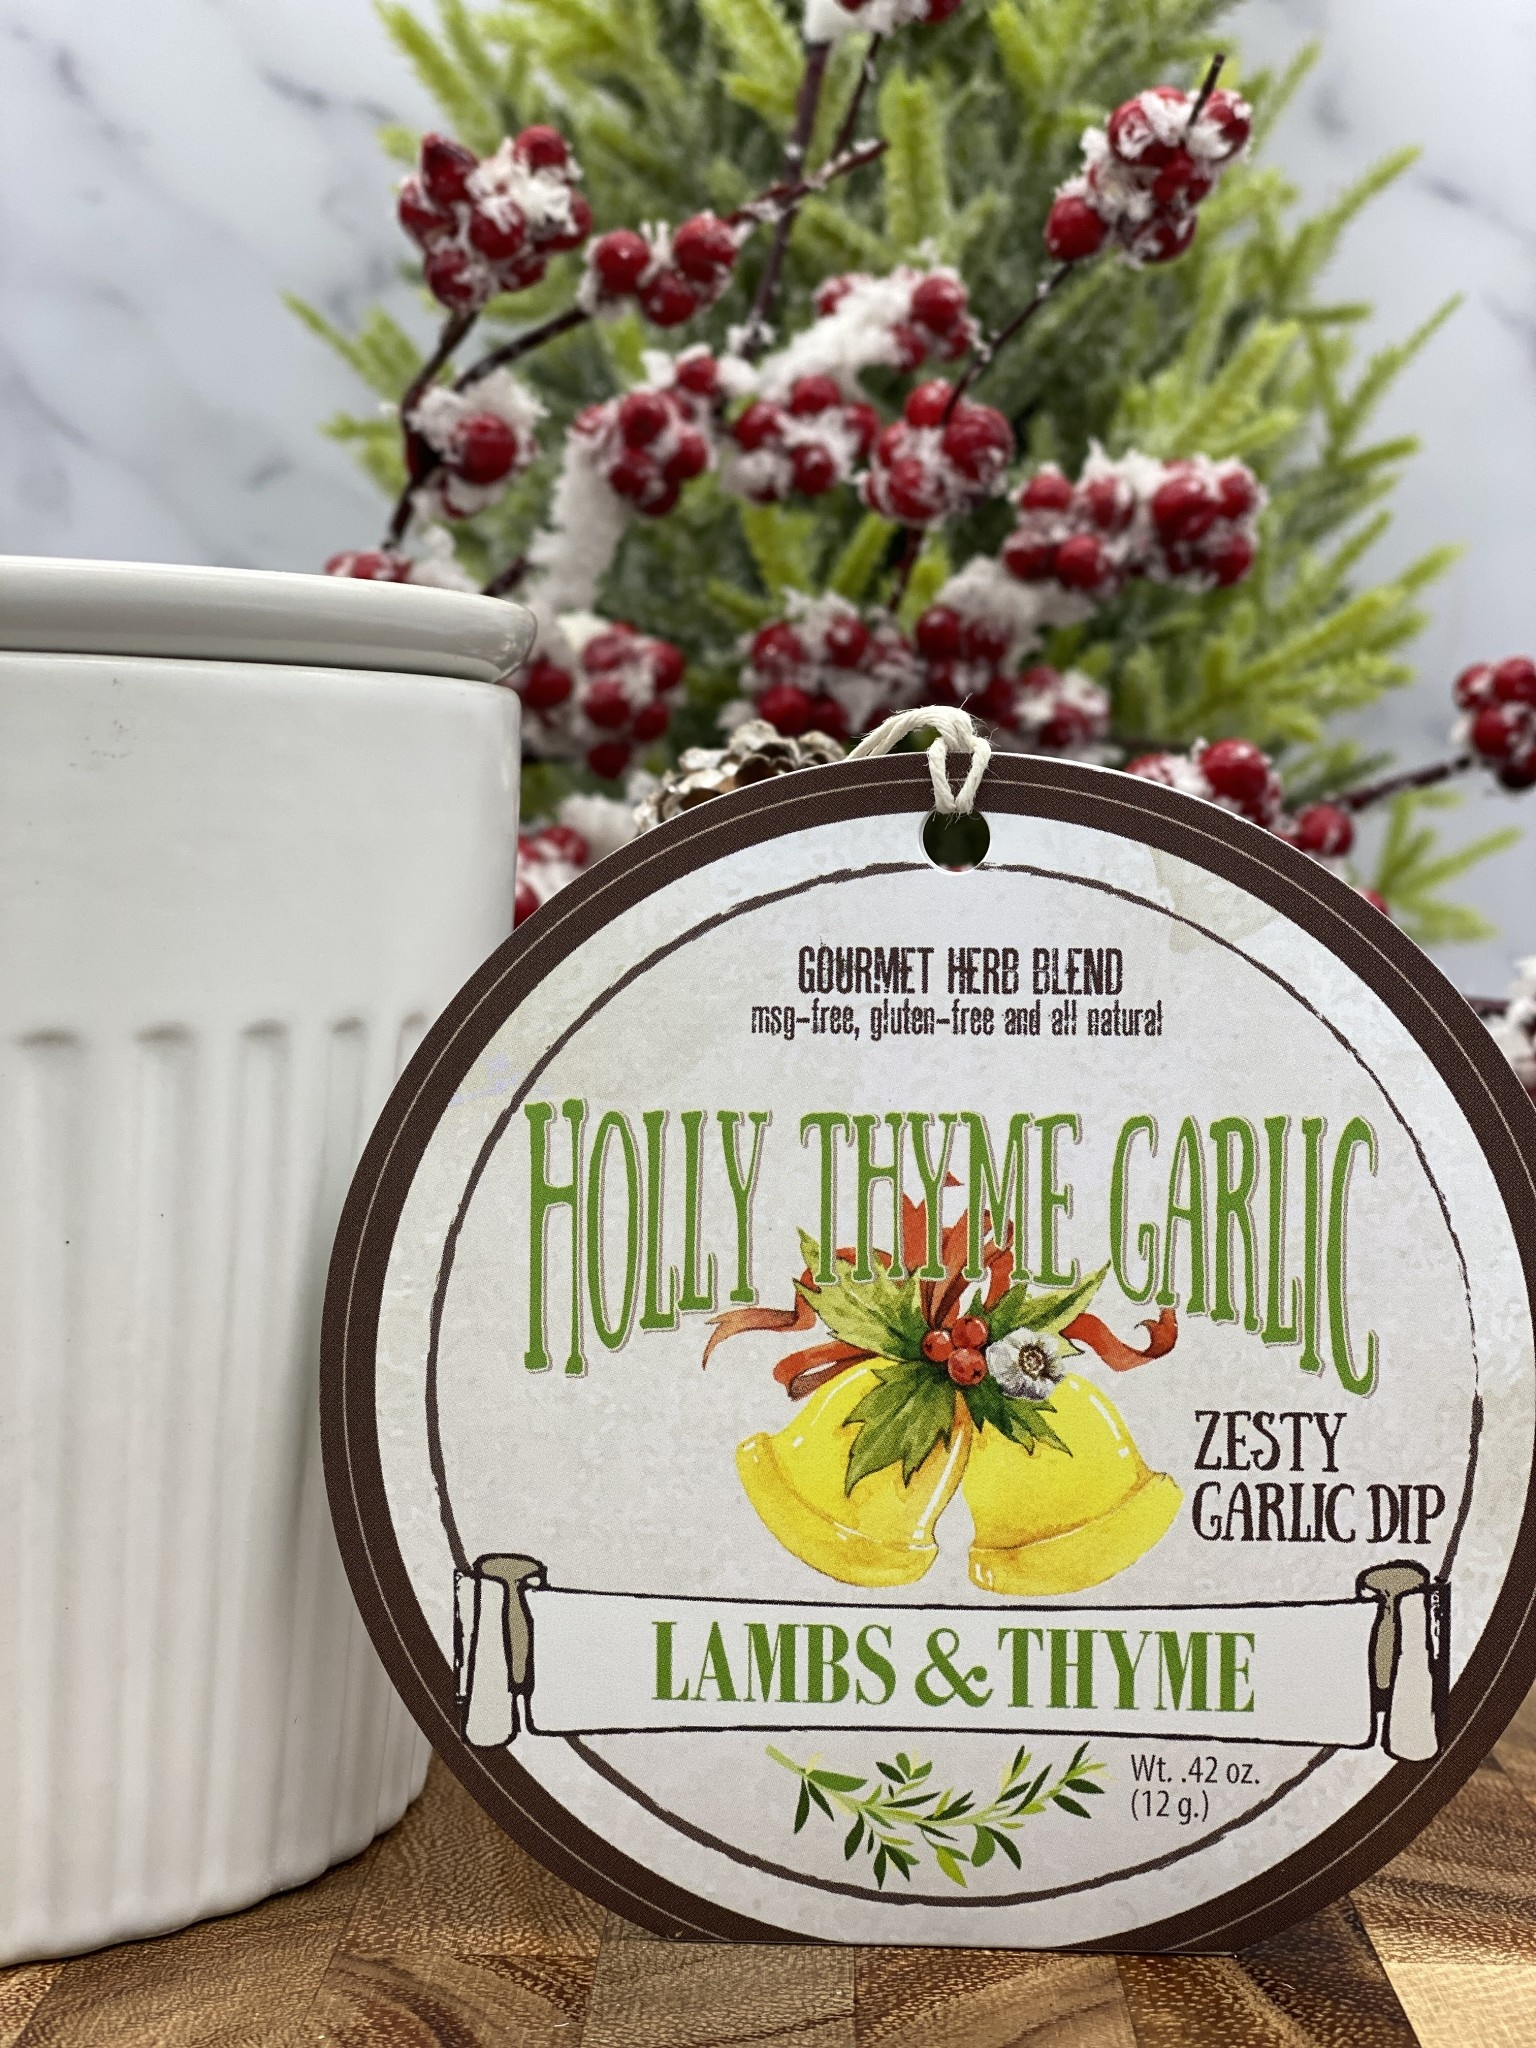 Lambs & Thyme Holiday Dips Holly Thyme Garlic